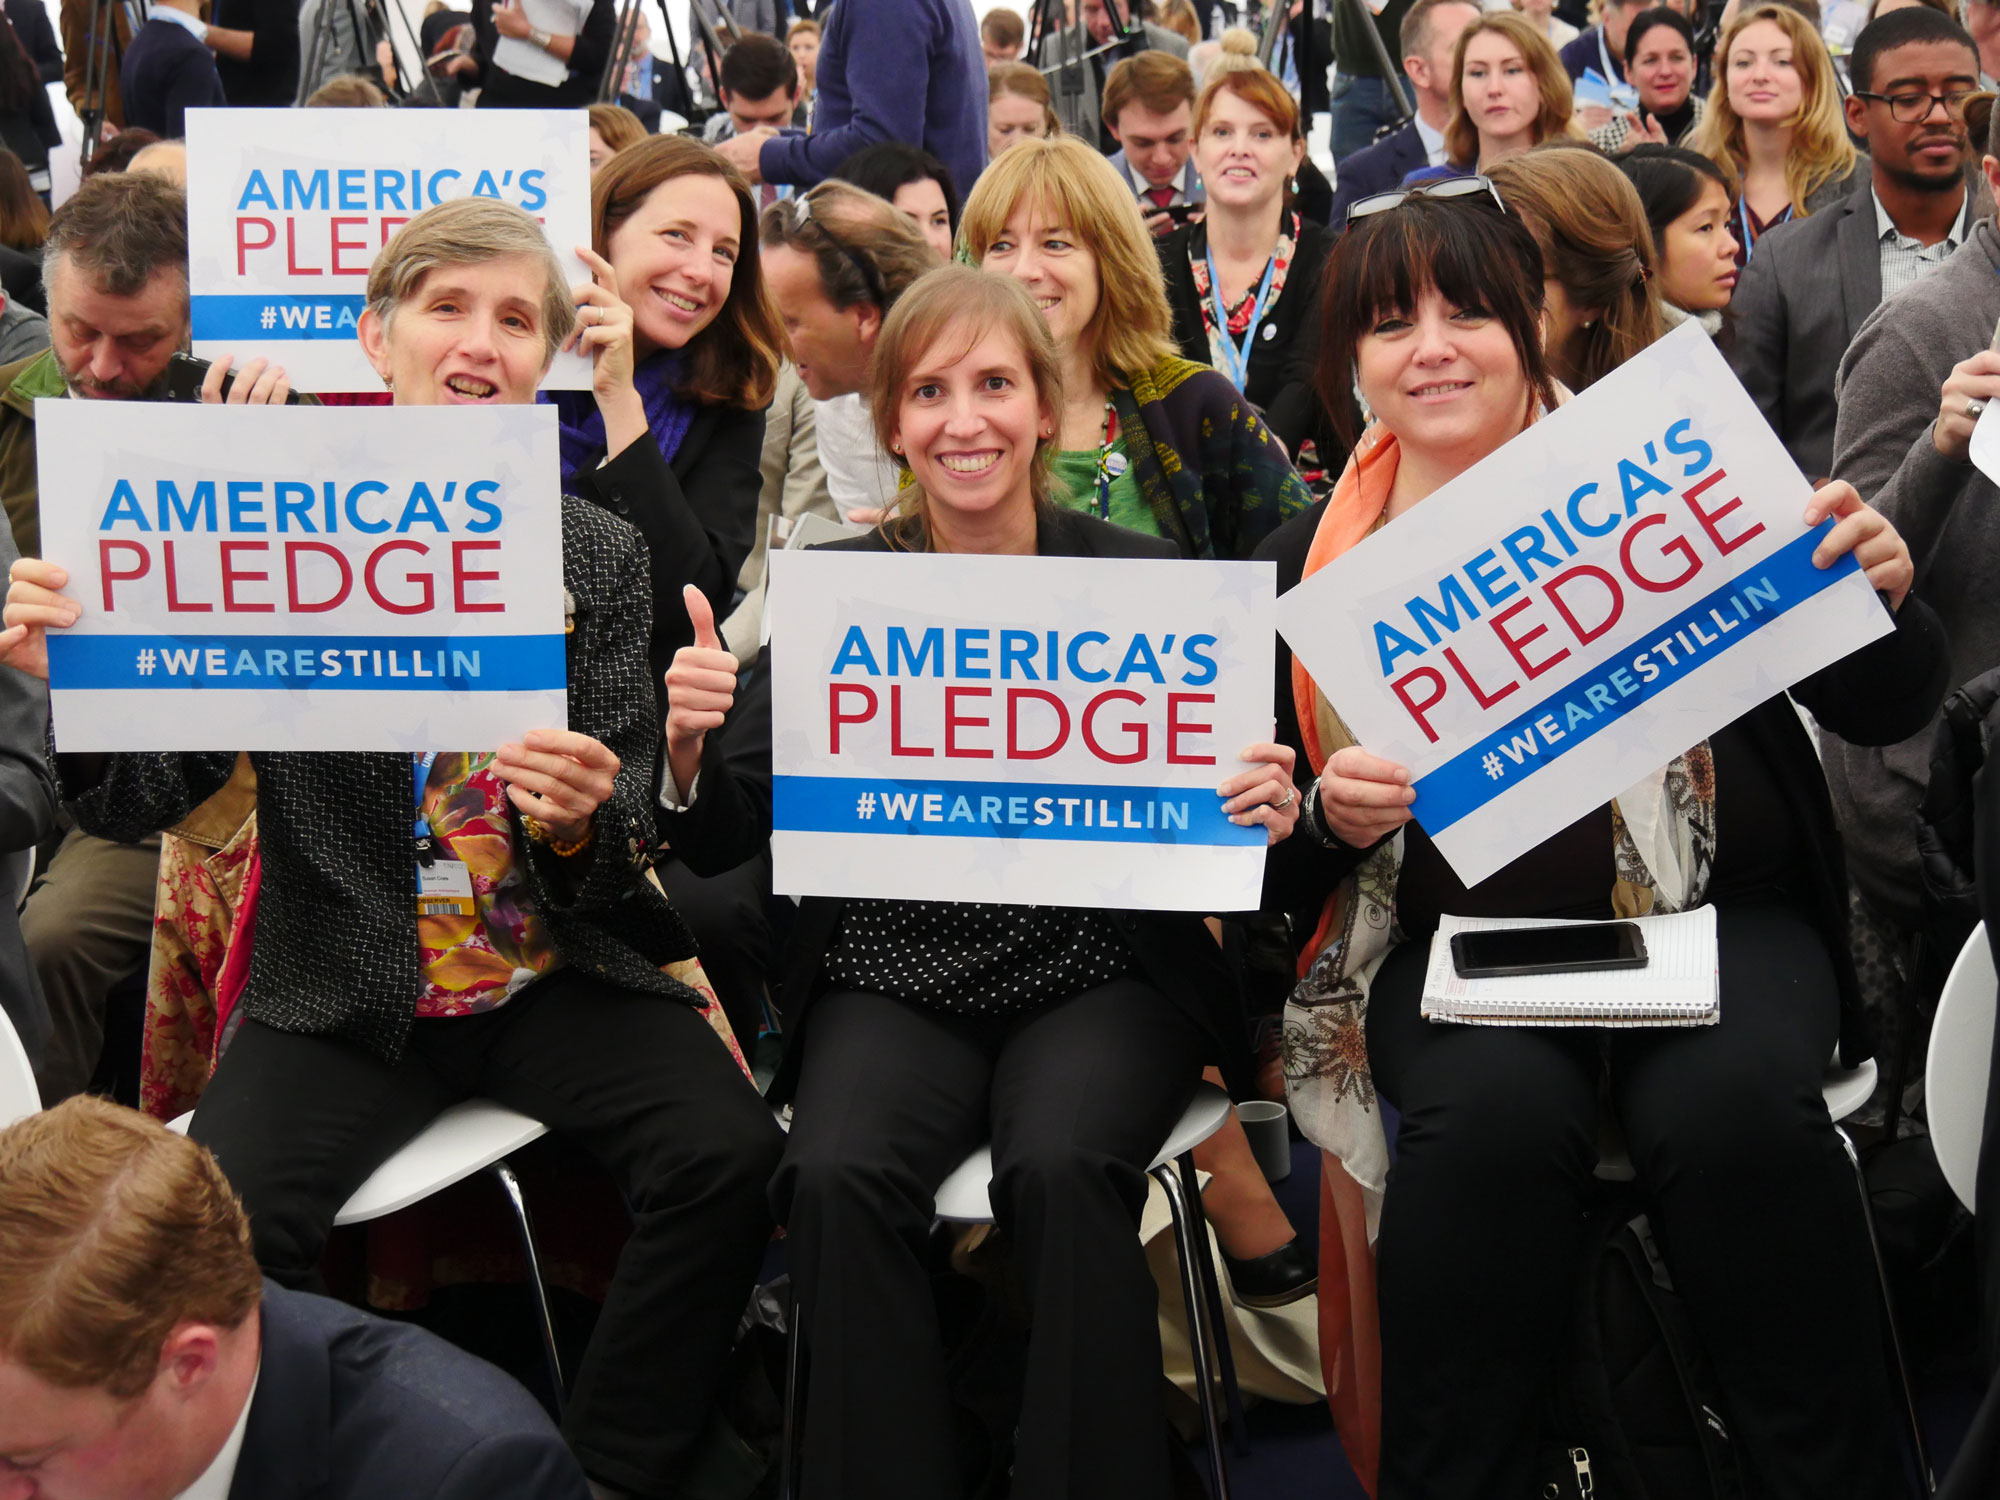 Americas Pledge